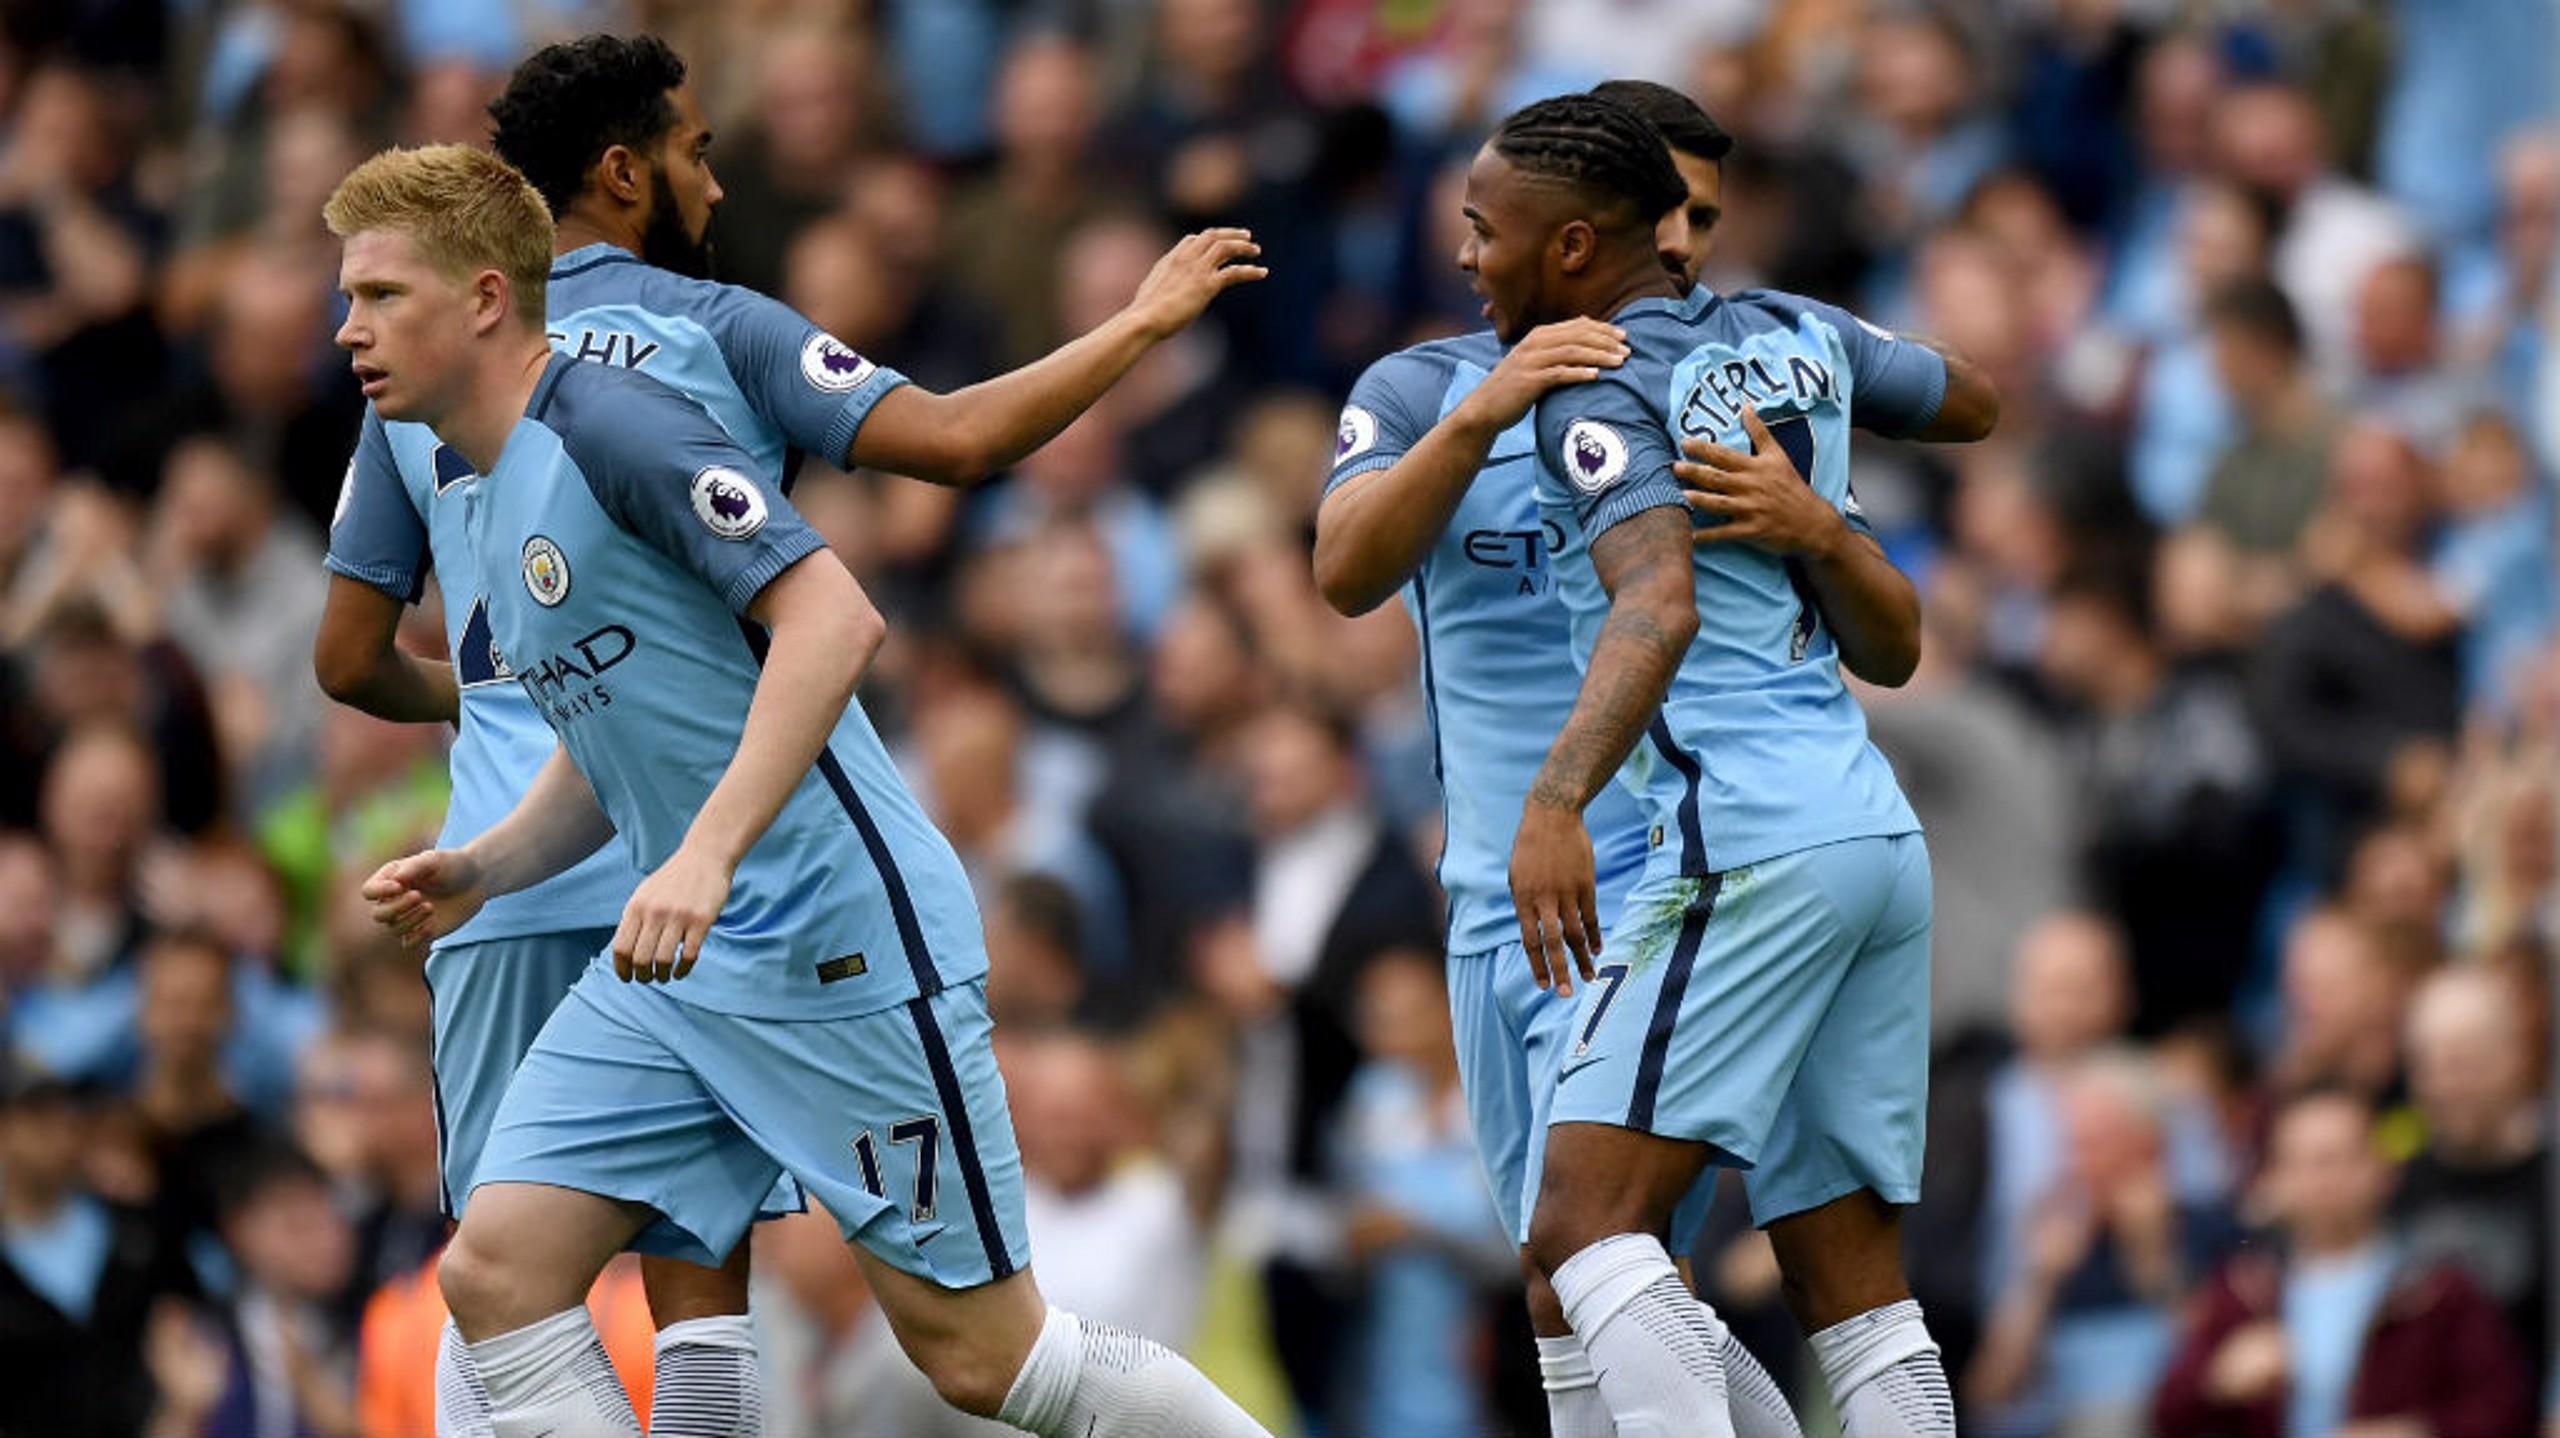 WHAT A FEELING: City celebrate Aguero's goal